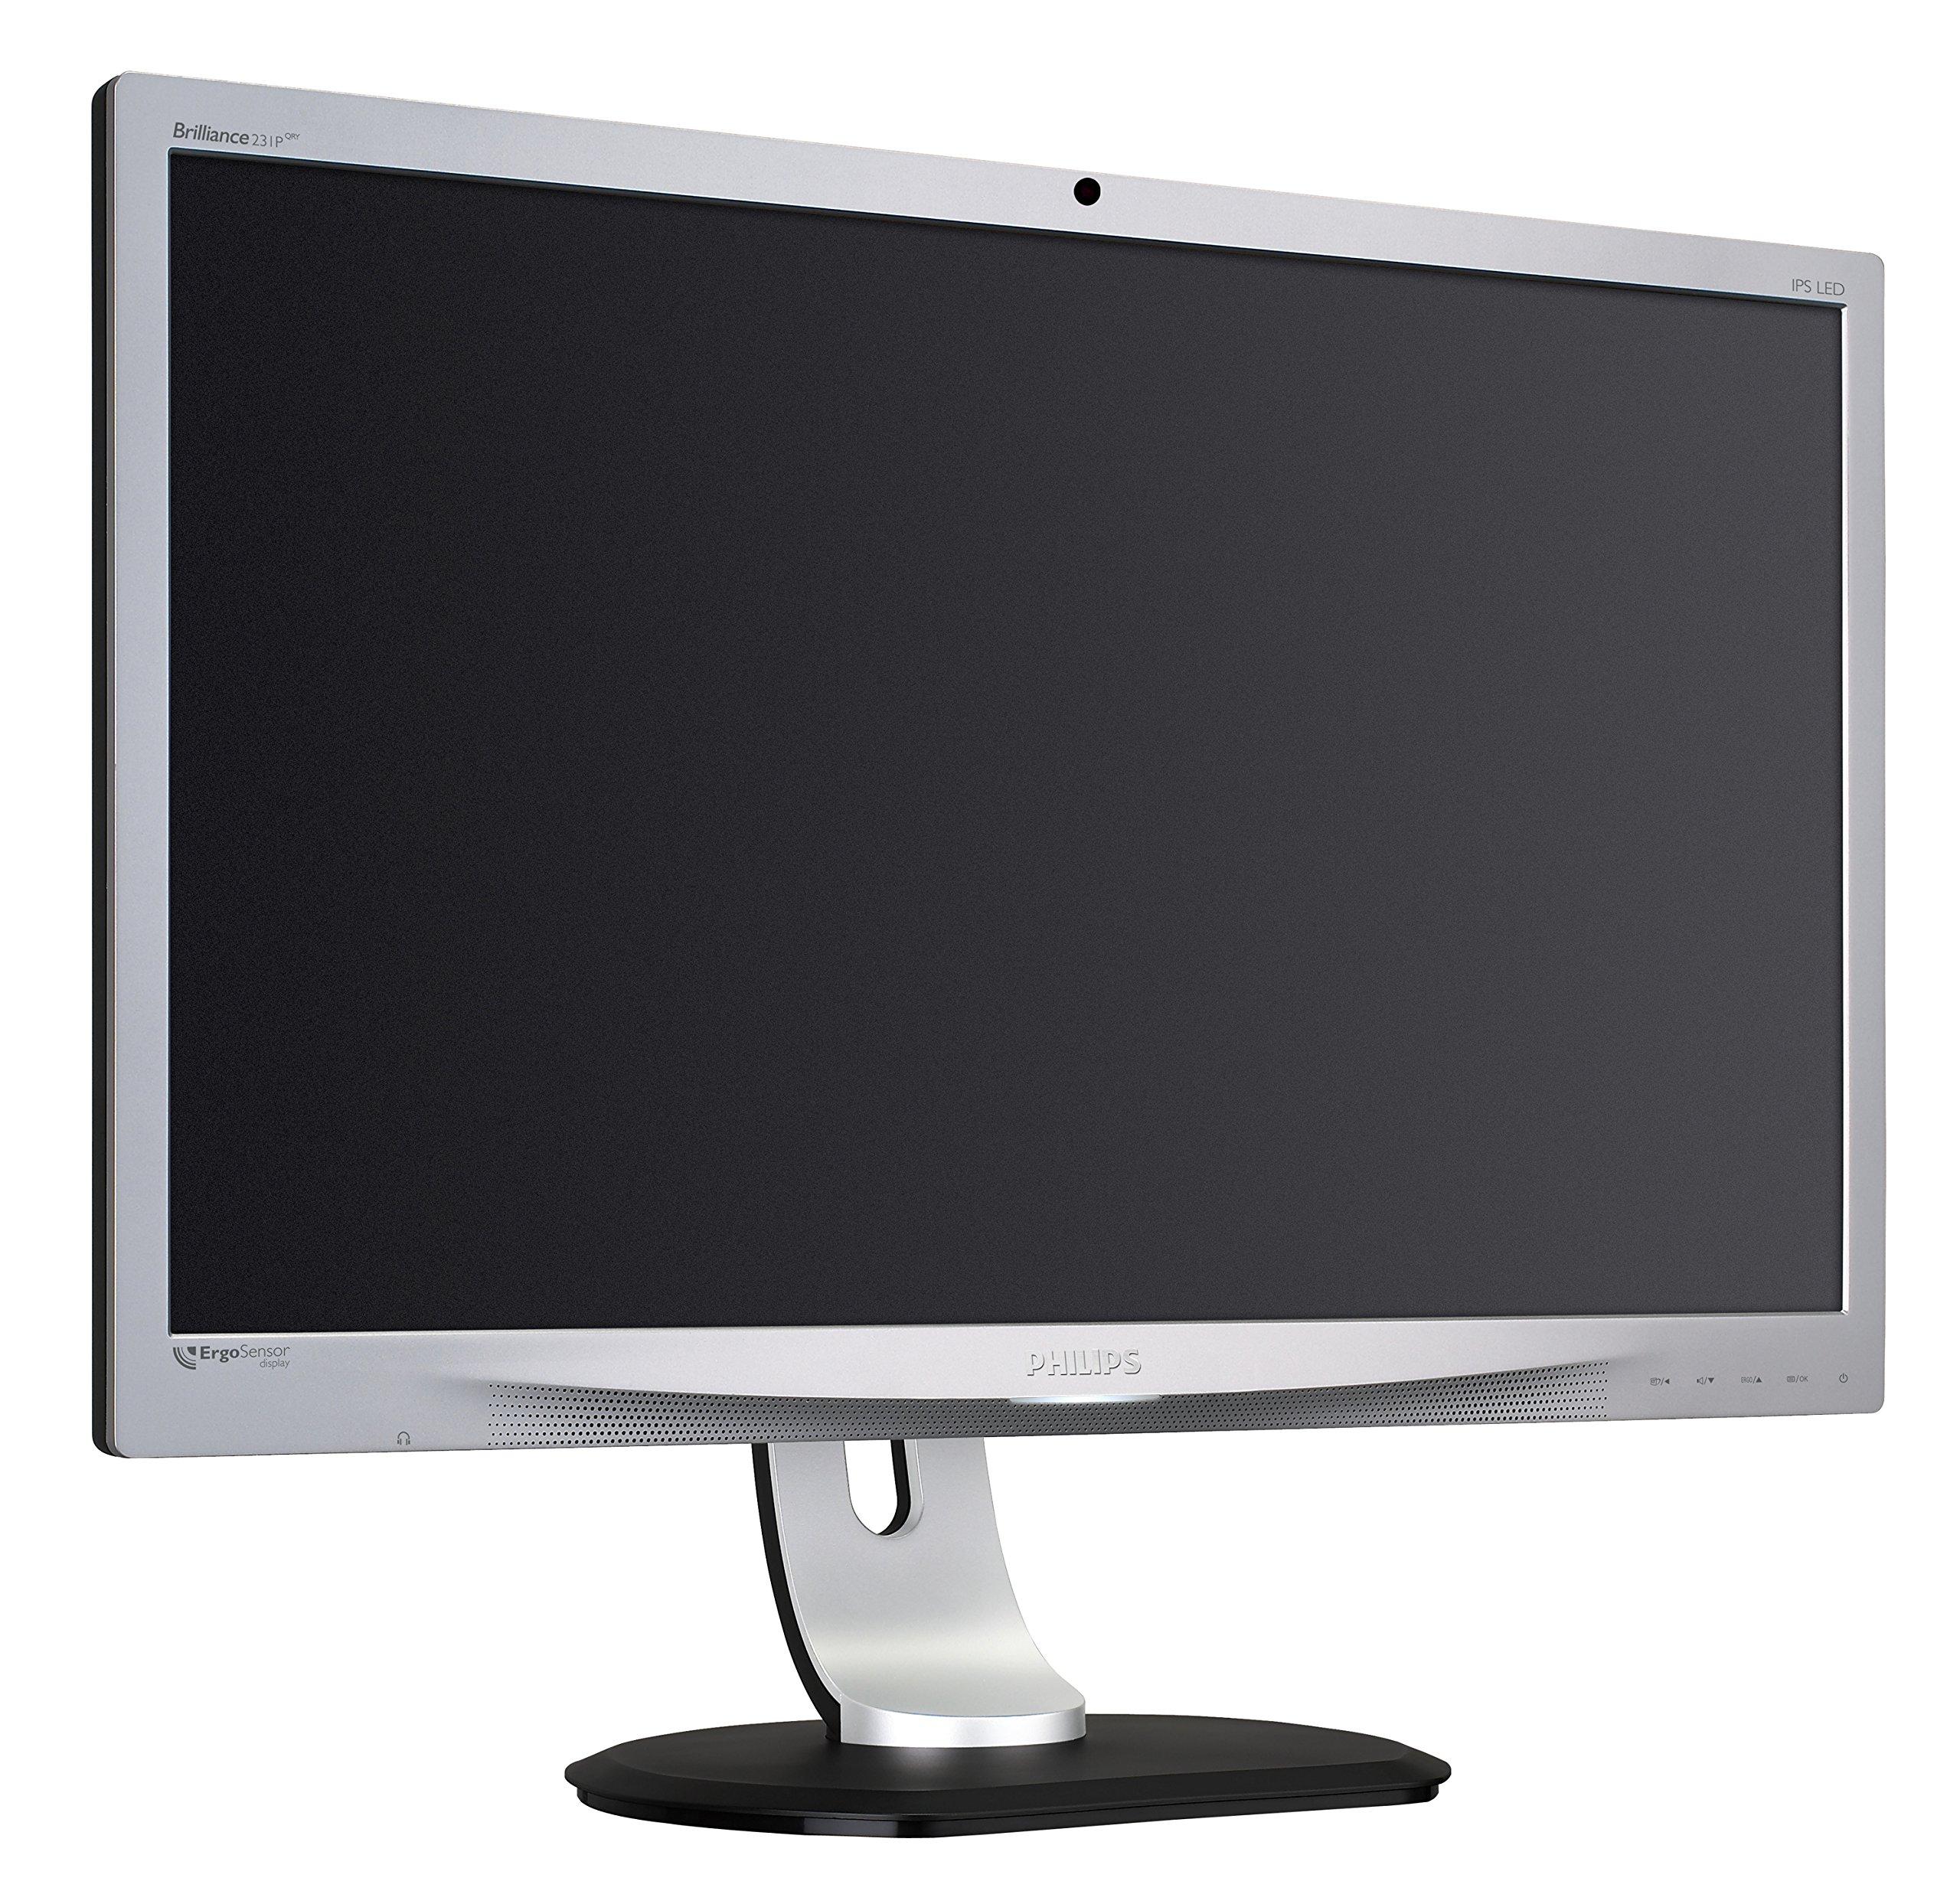 Philips Brilliance - Monitor (retroiluminación LED 231P4QRYES/00, 58,4 cm (23